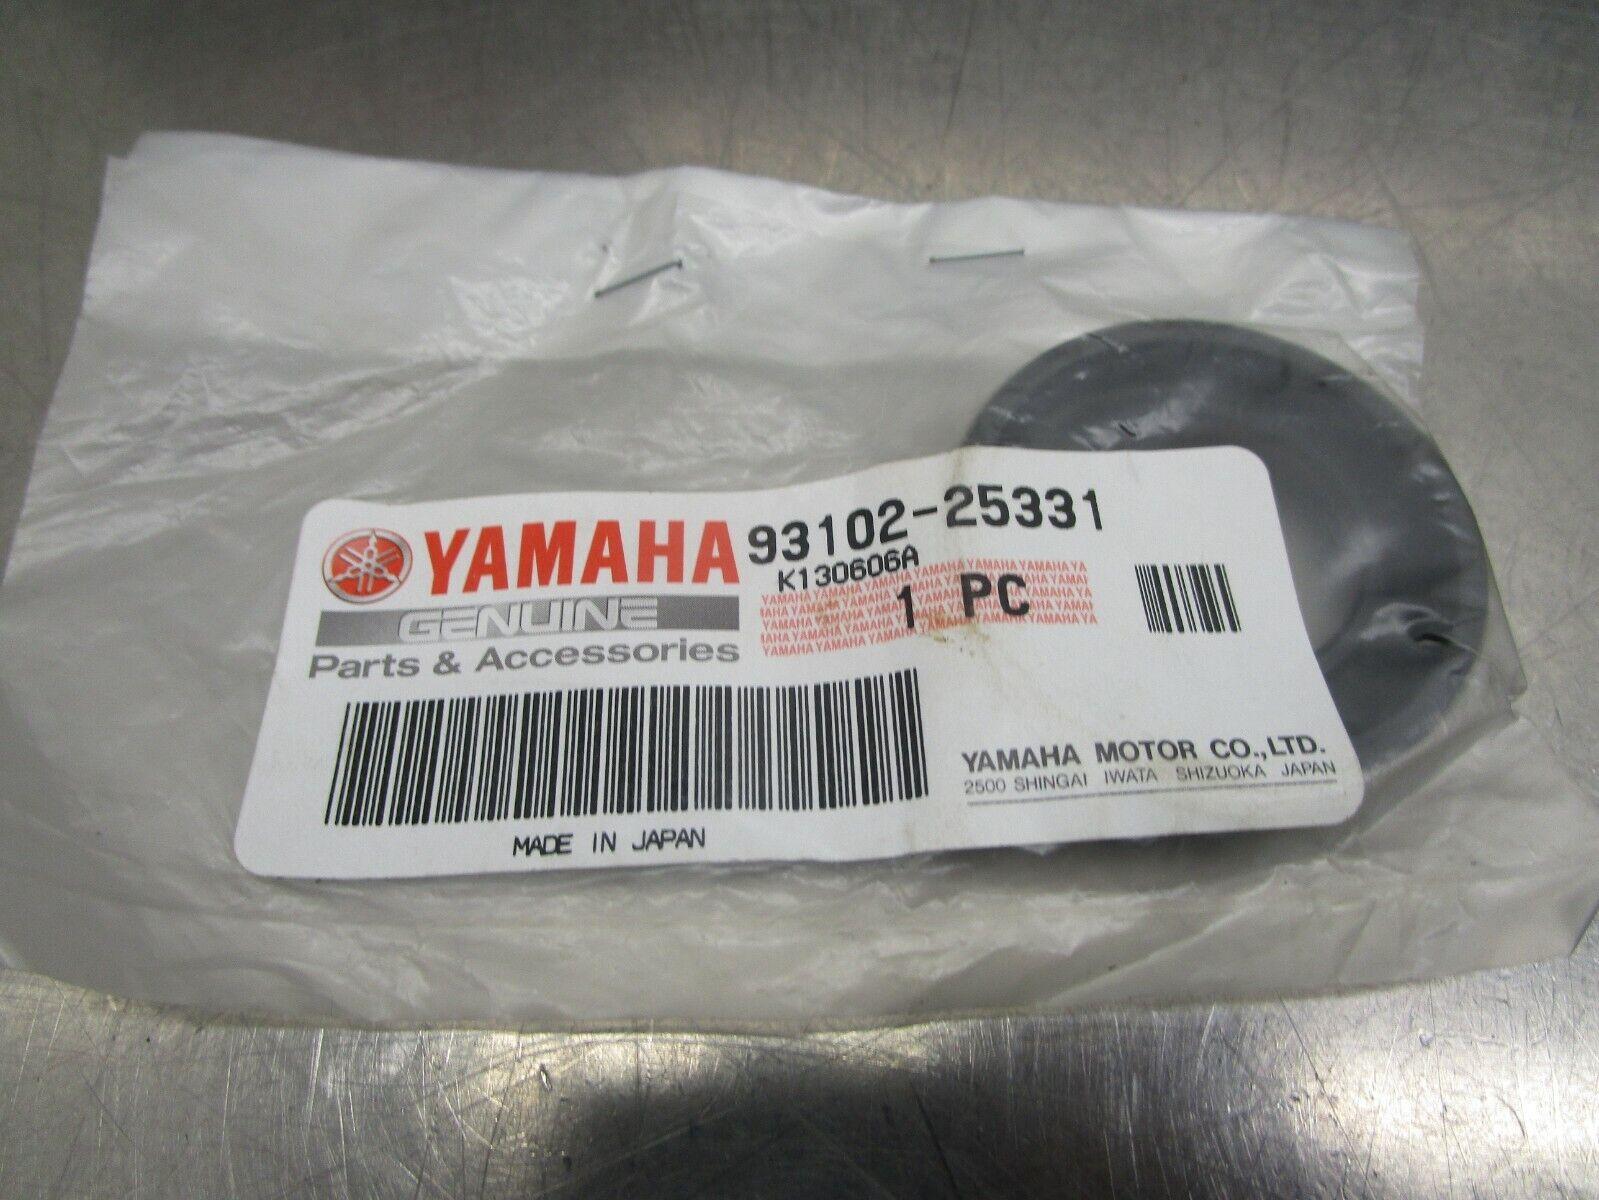 Yamaha 93102-25331-00 OIL SEAL,SD-TYPE; 931022533100